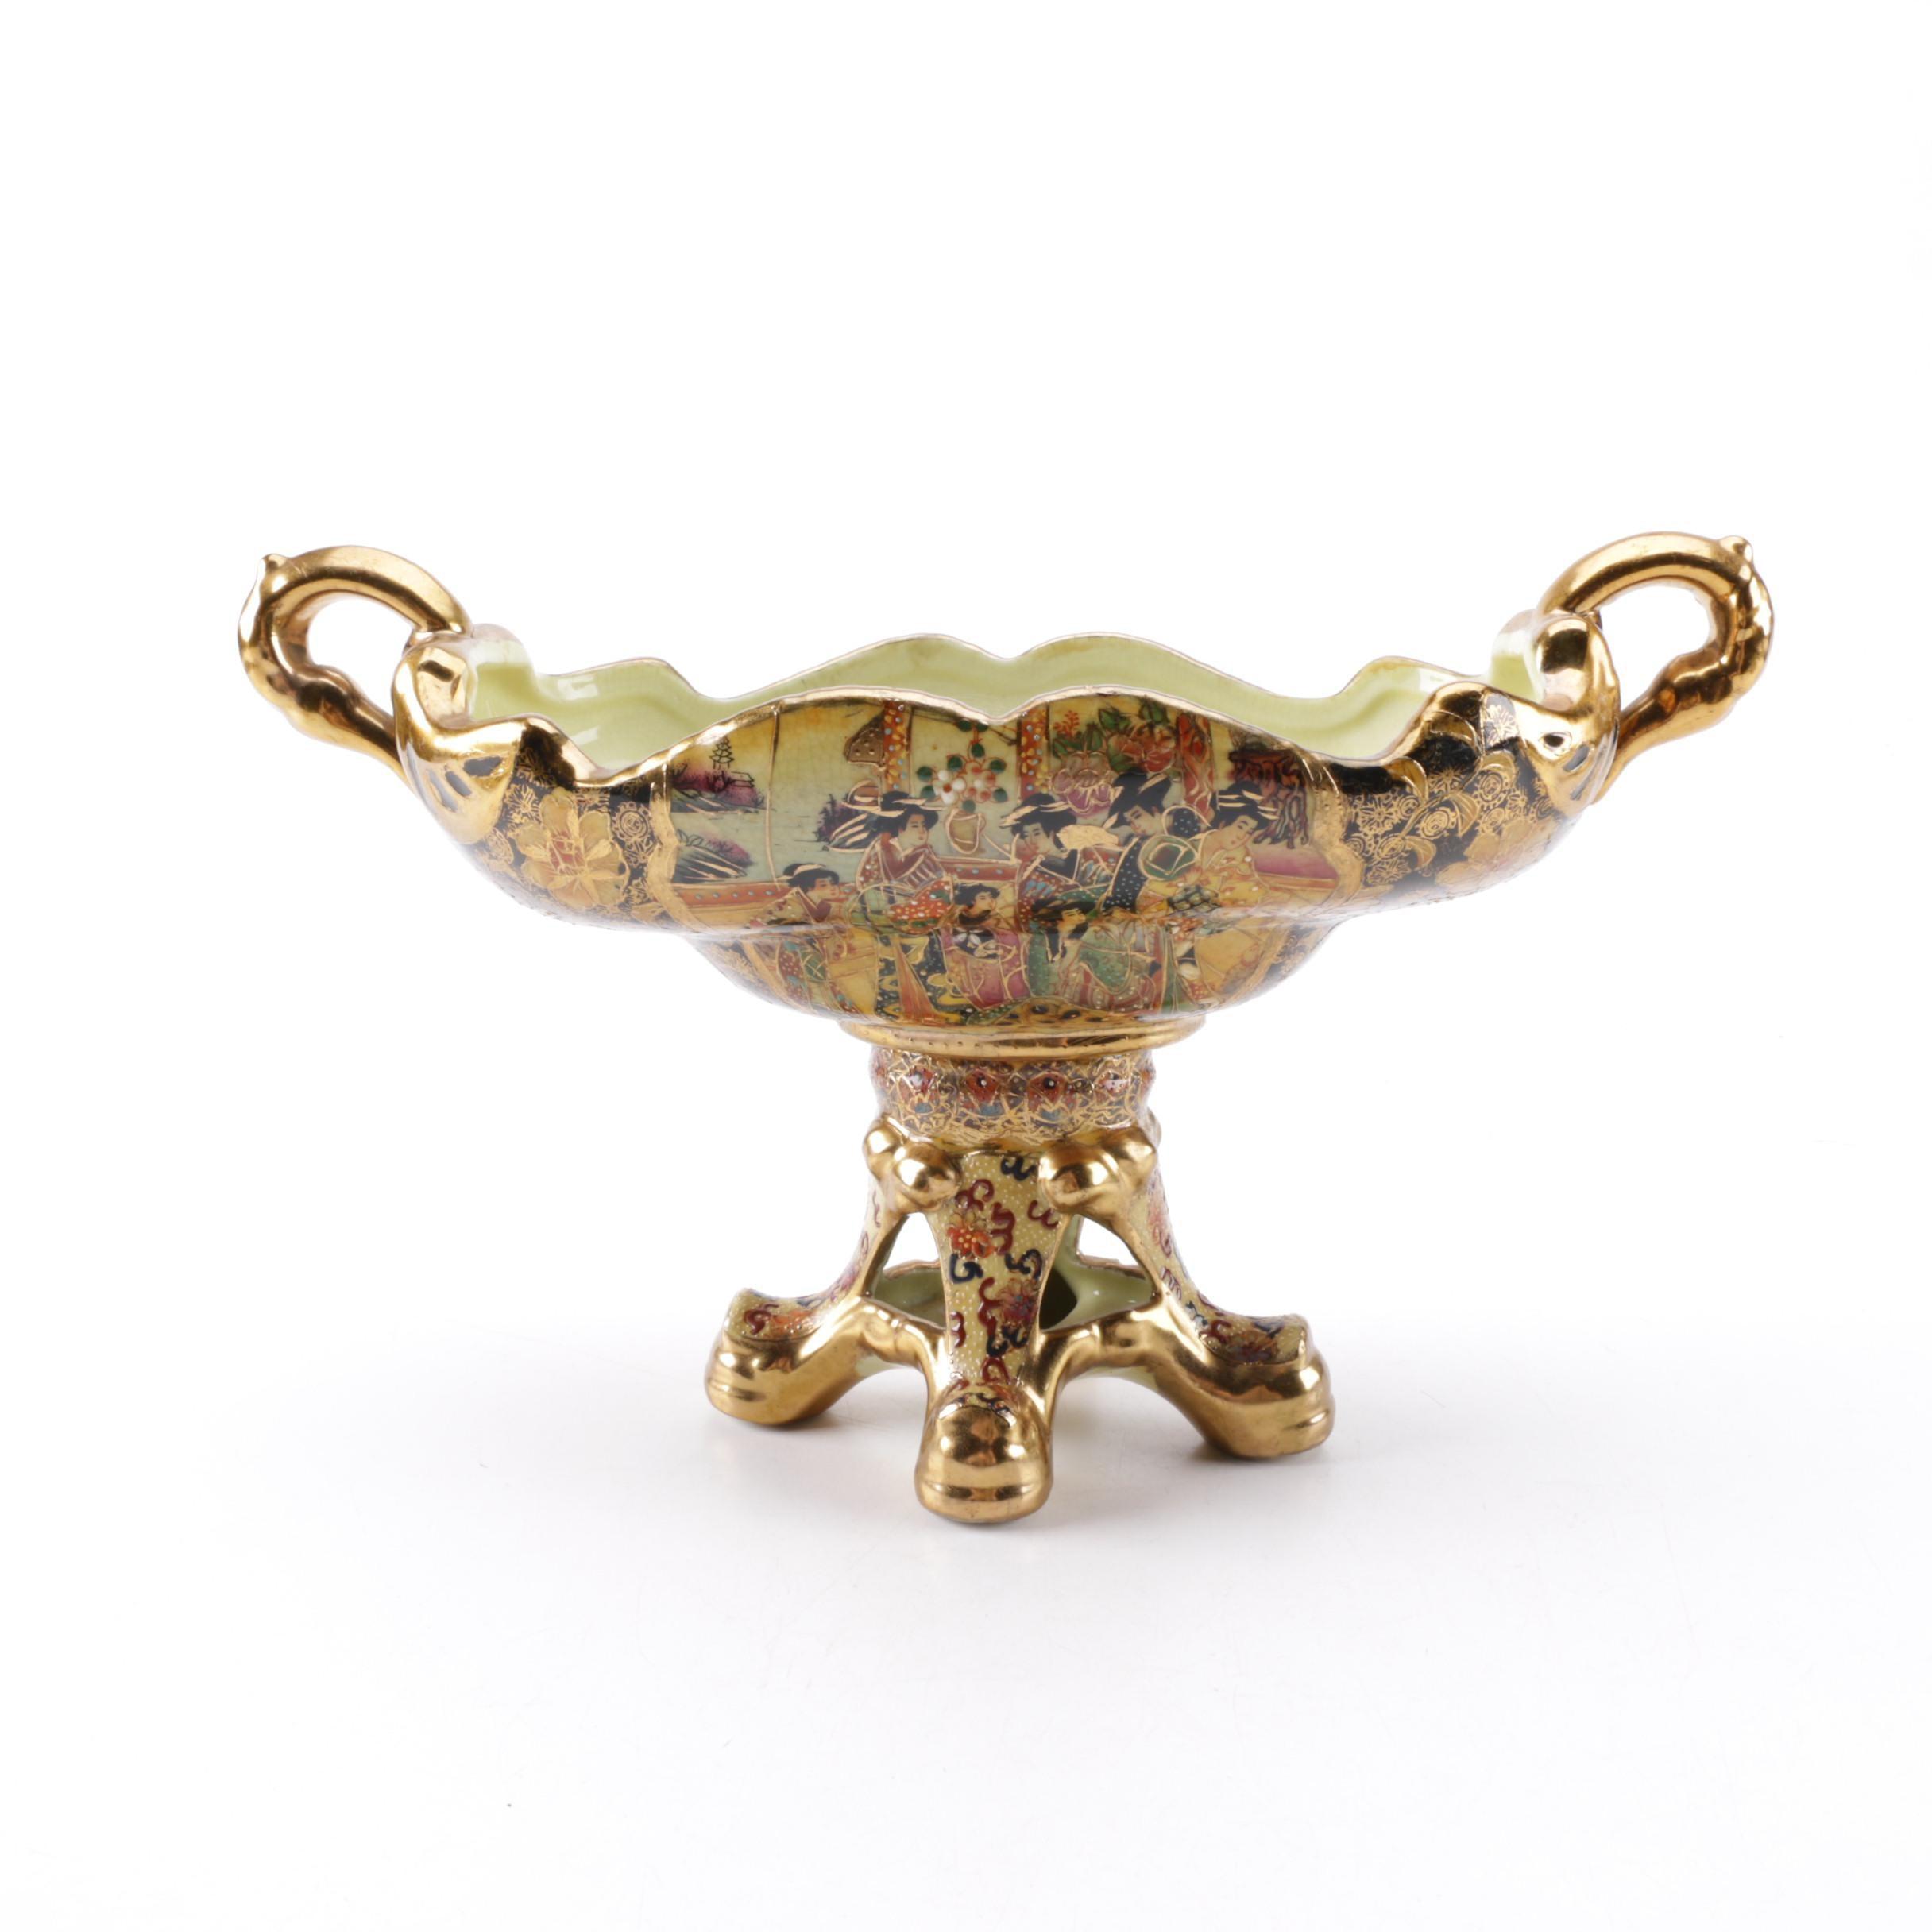 Chinese Satsuma Style Ceramic Centerpiece